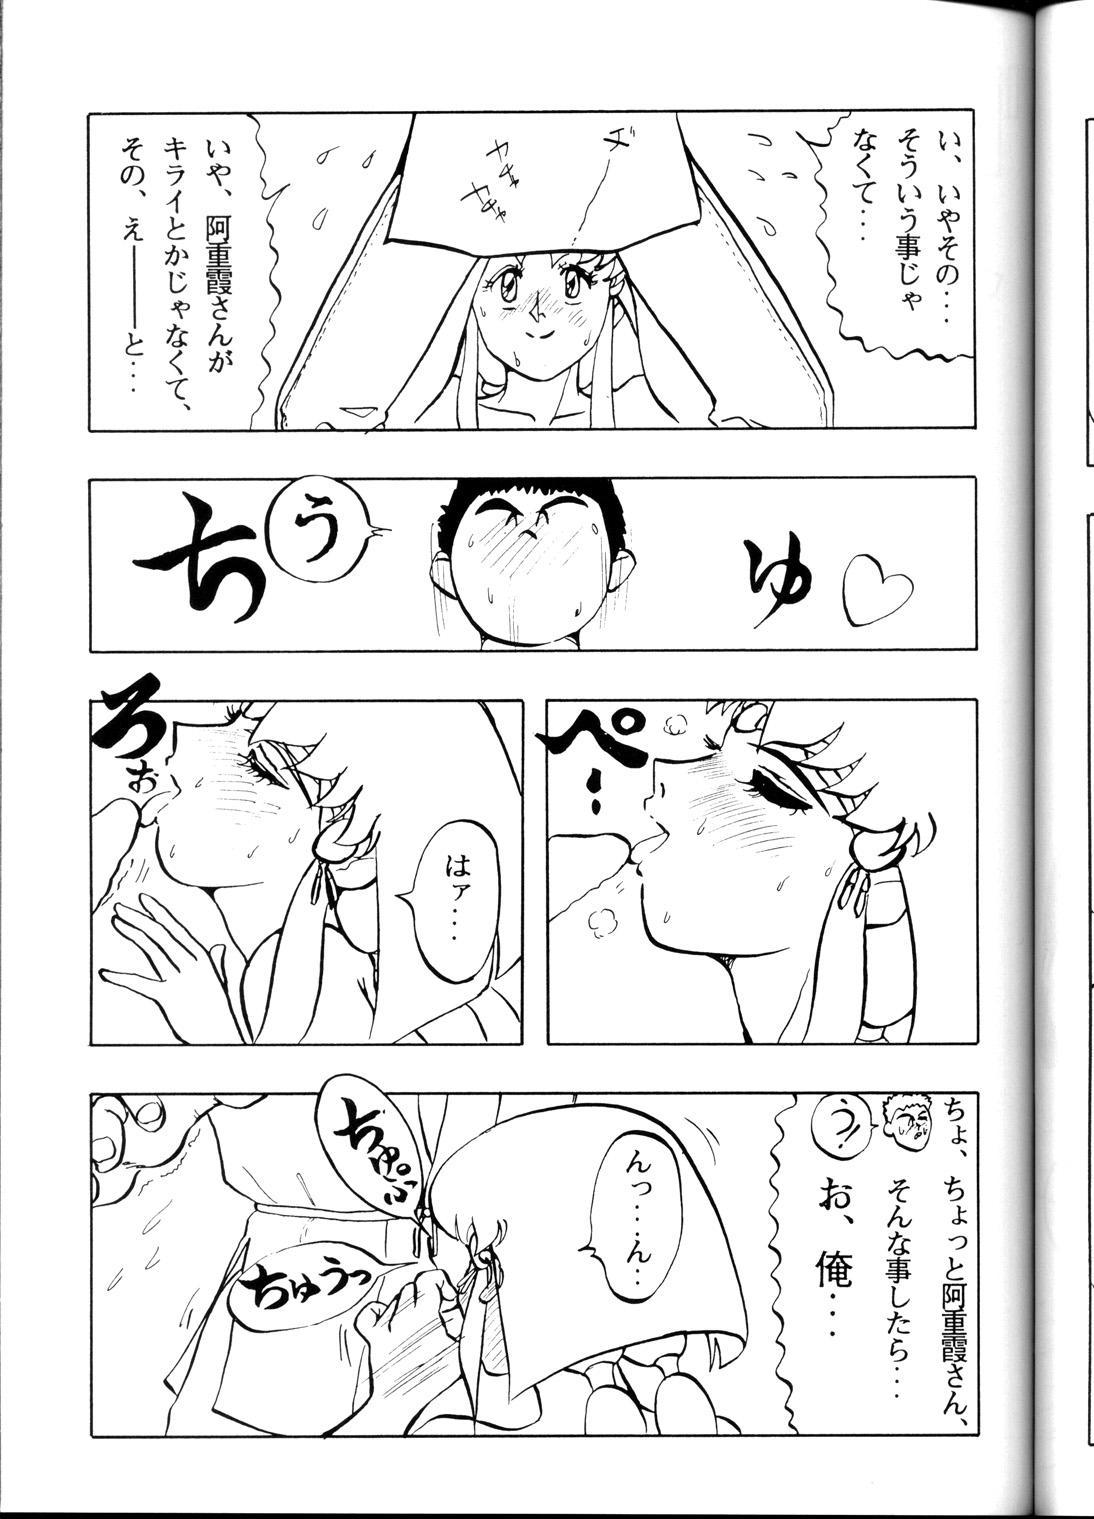 [B.B.C] Tenchi Muyou! Ryou-ou-ki Kaiteiben (Tenchi Muyou!) 43